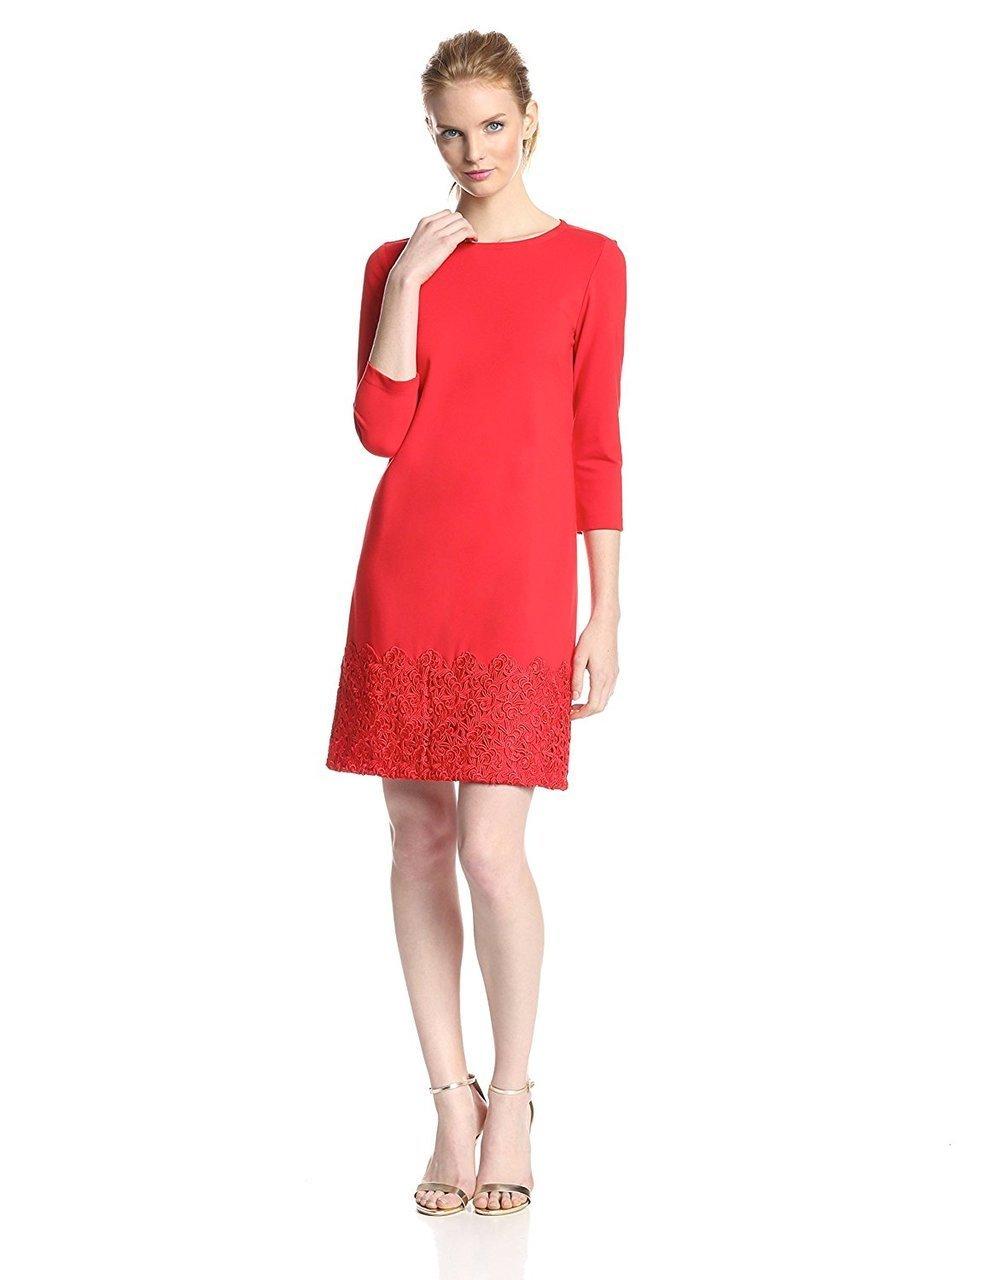 Taylor - Crochet Hem Jewel Neck Dress 5170M